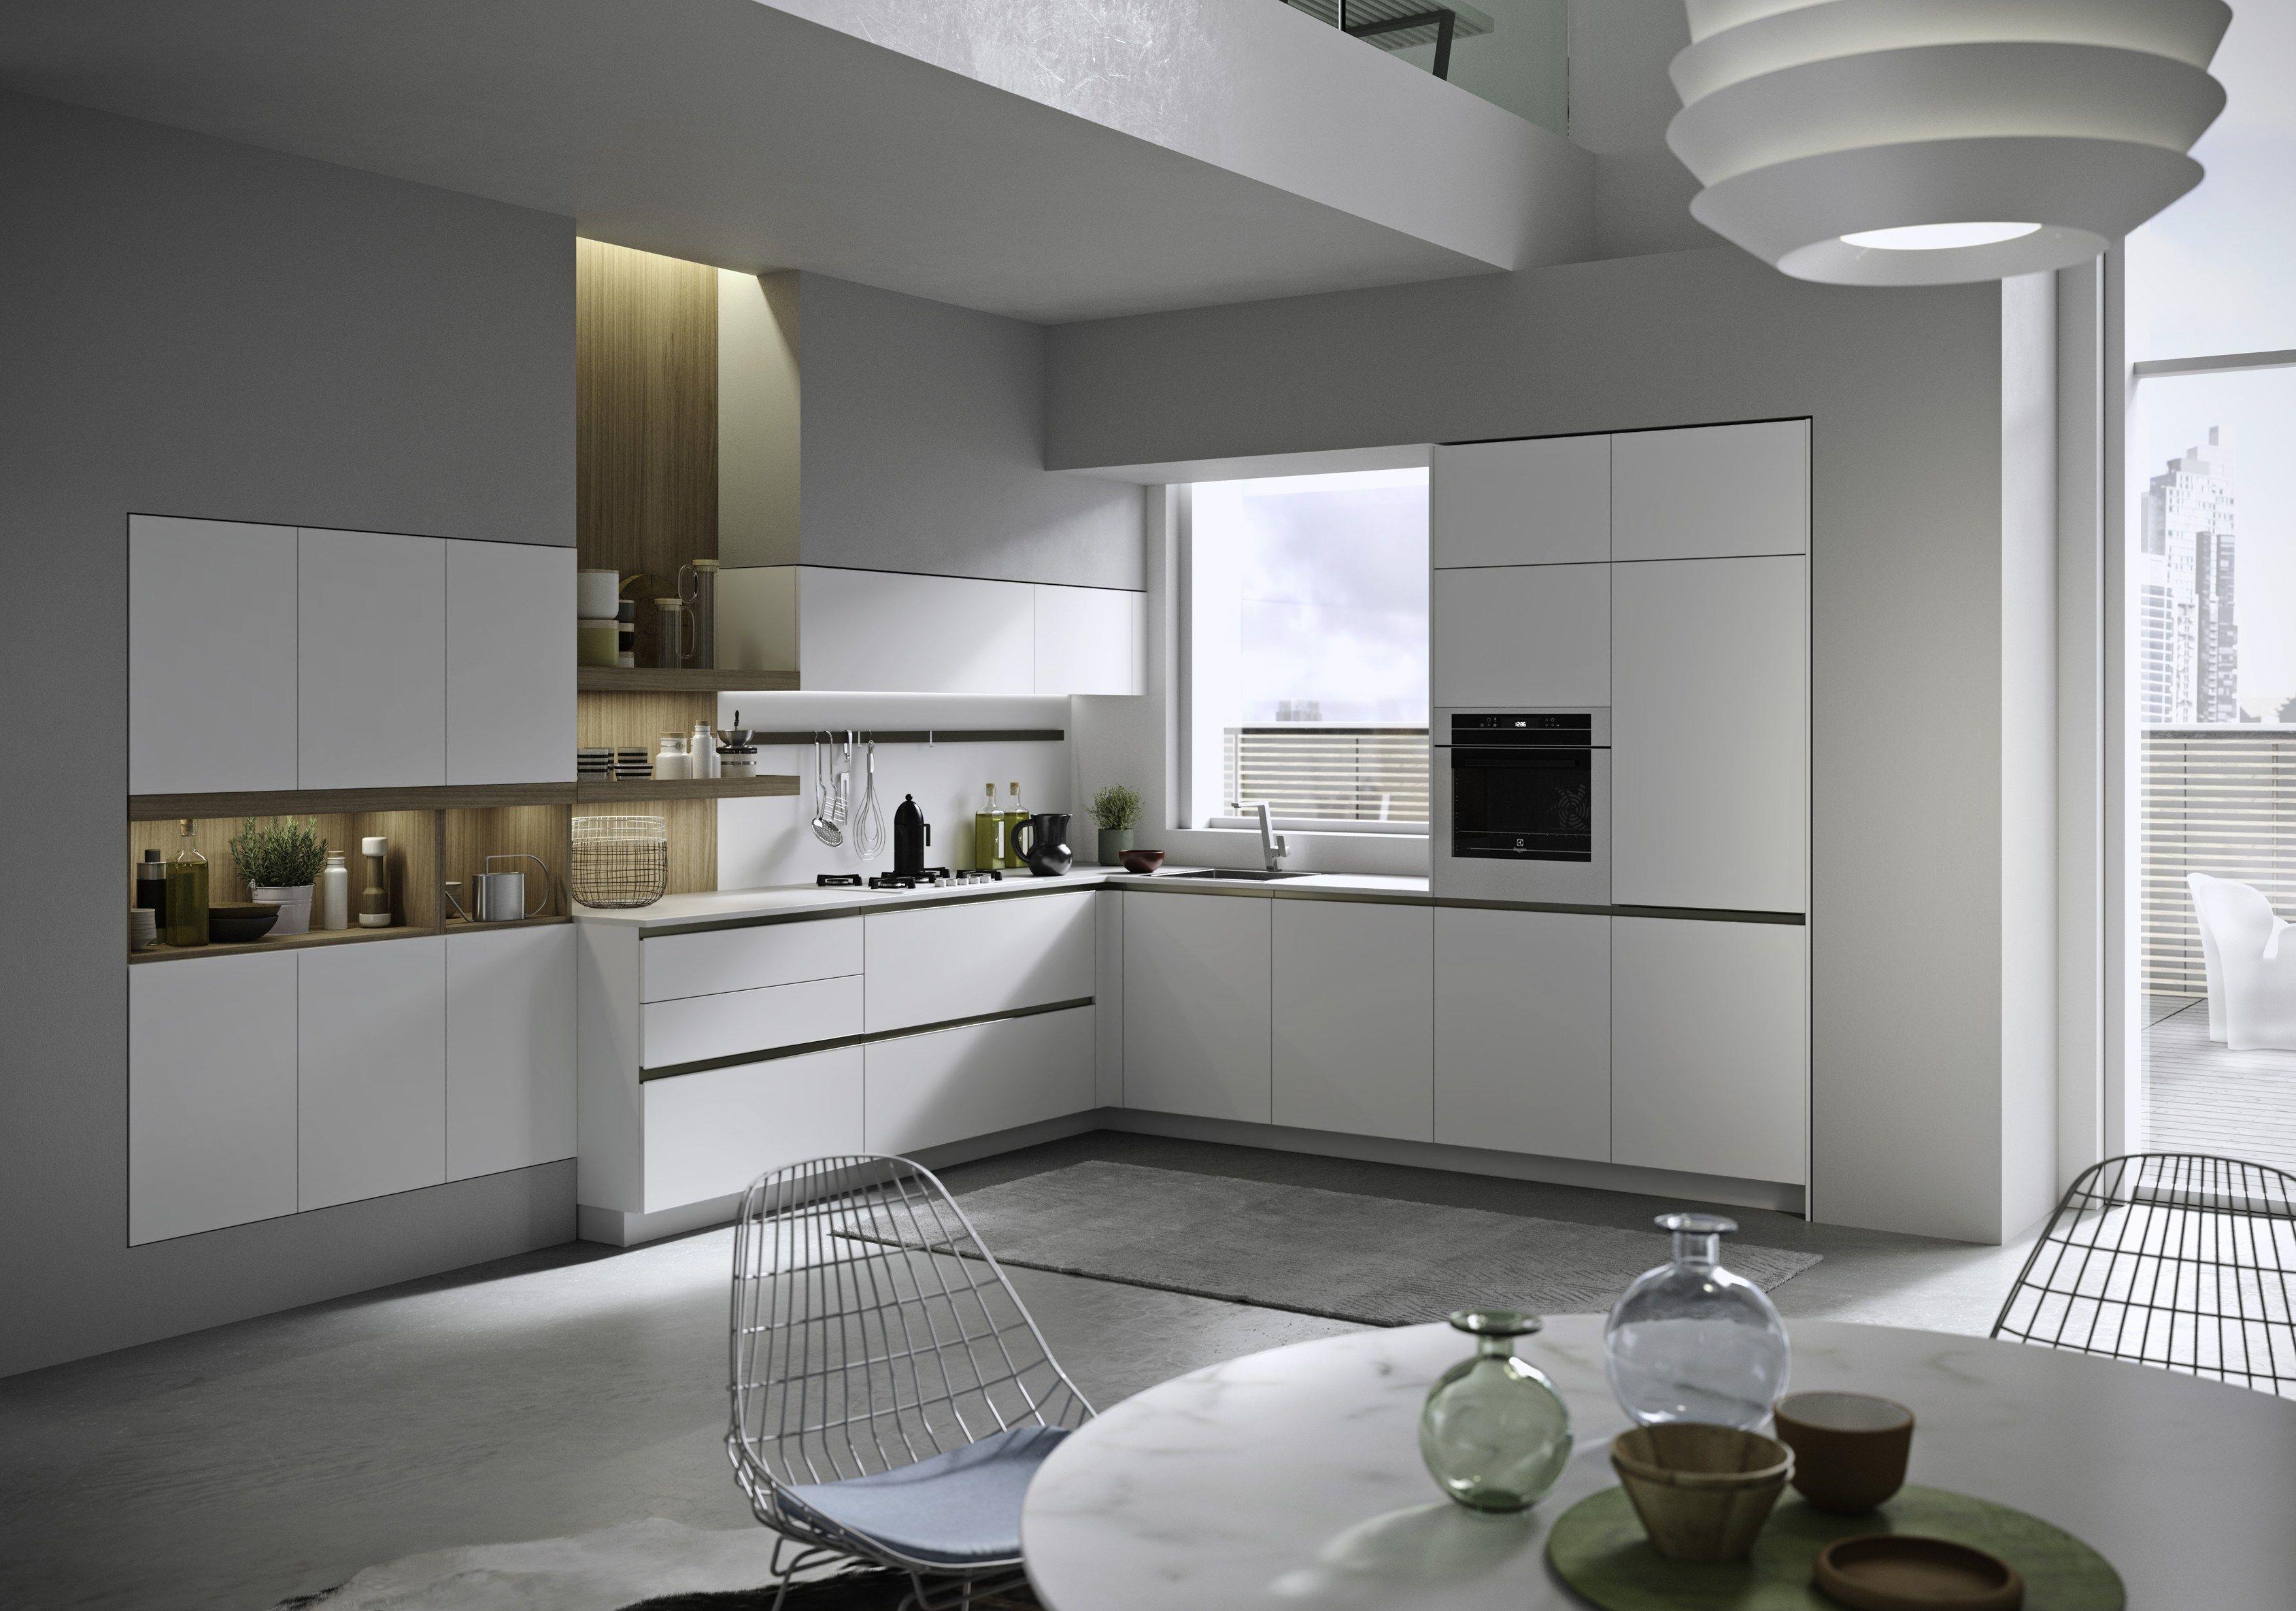 Cocina Integral Con Tiradores Integrados JOY By Snaidero Diseño Snaidero